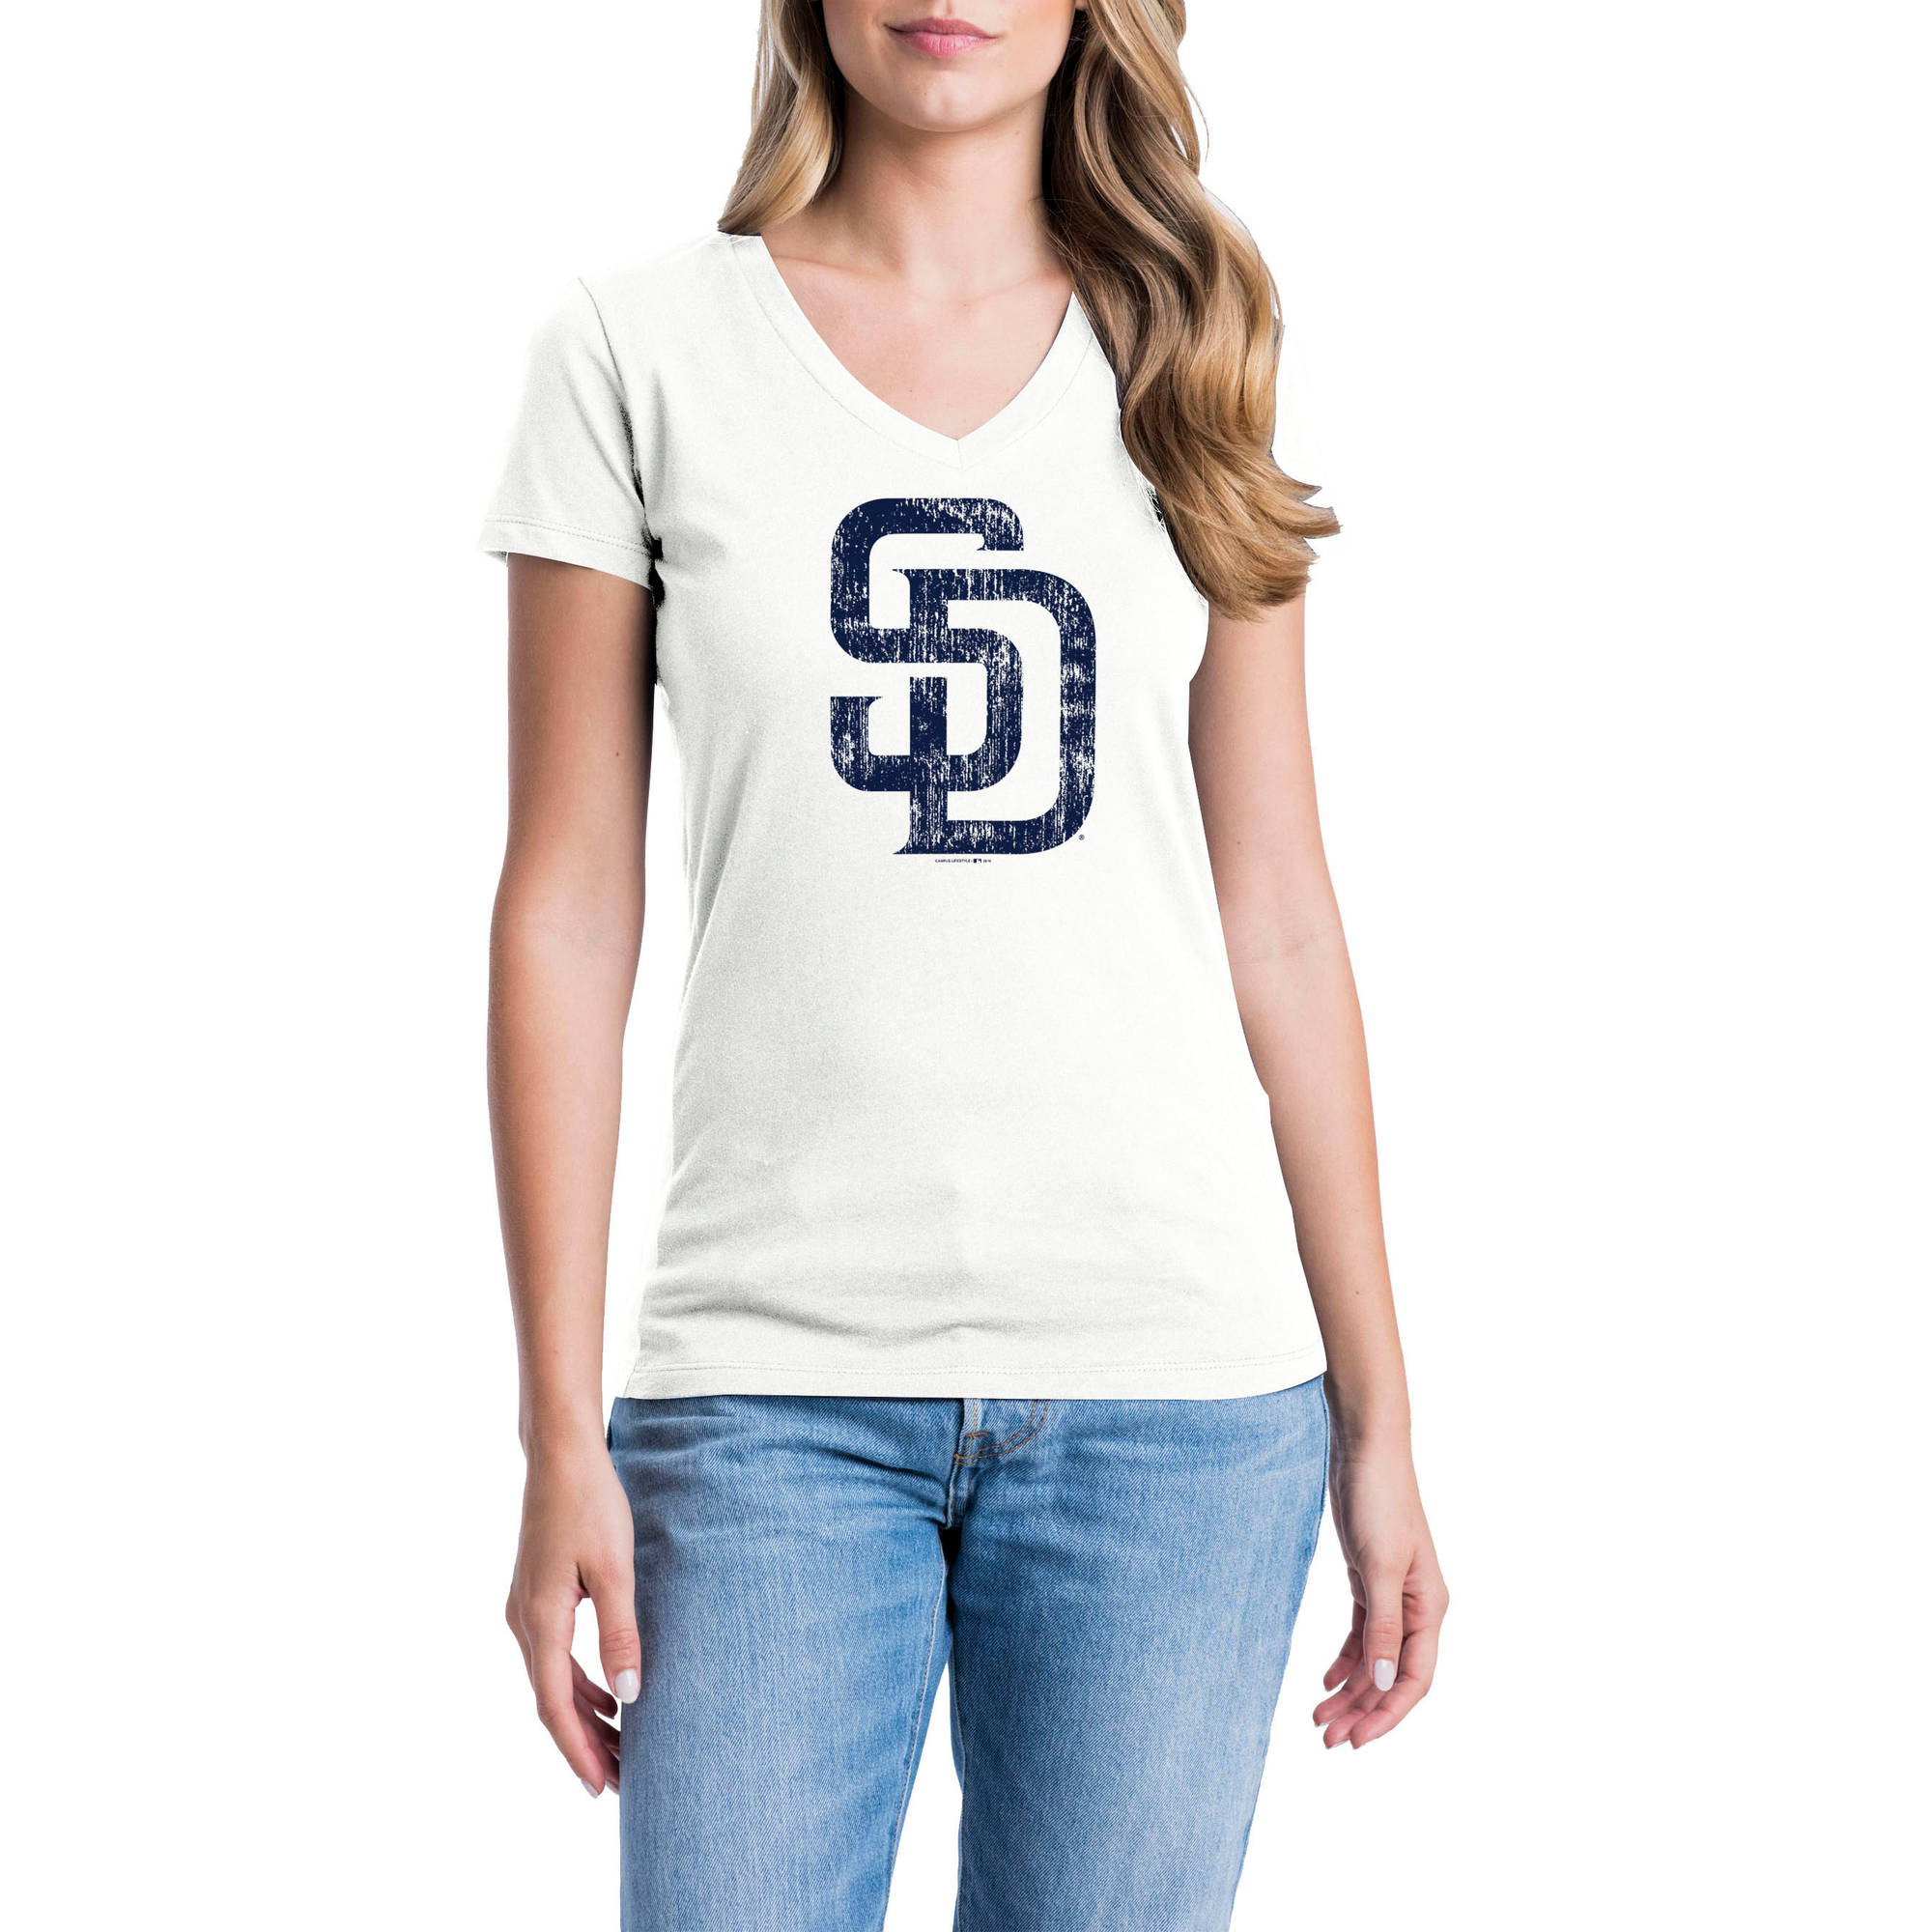 San Diego Padres Womens Short Sleeve Graphic Tee